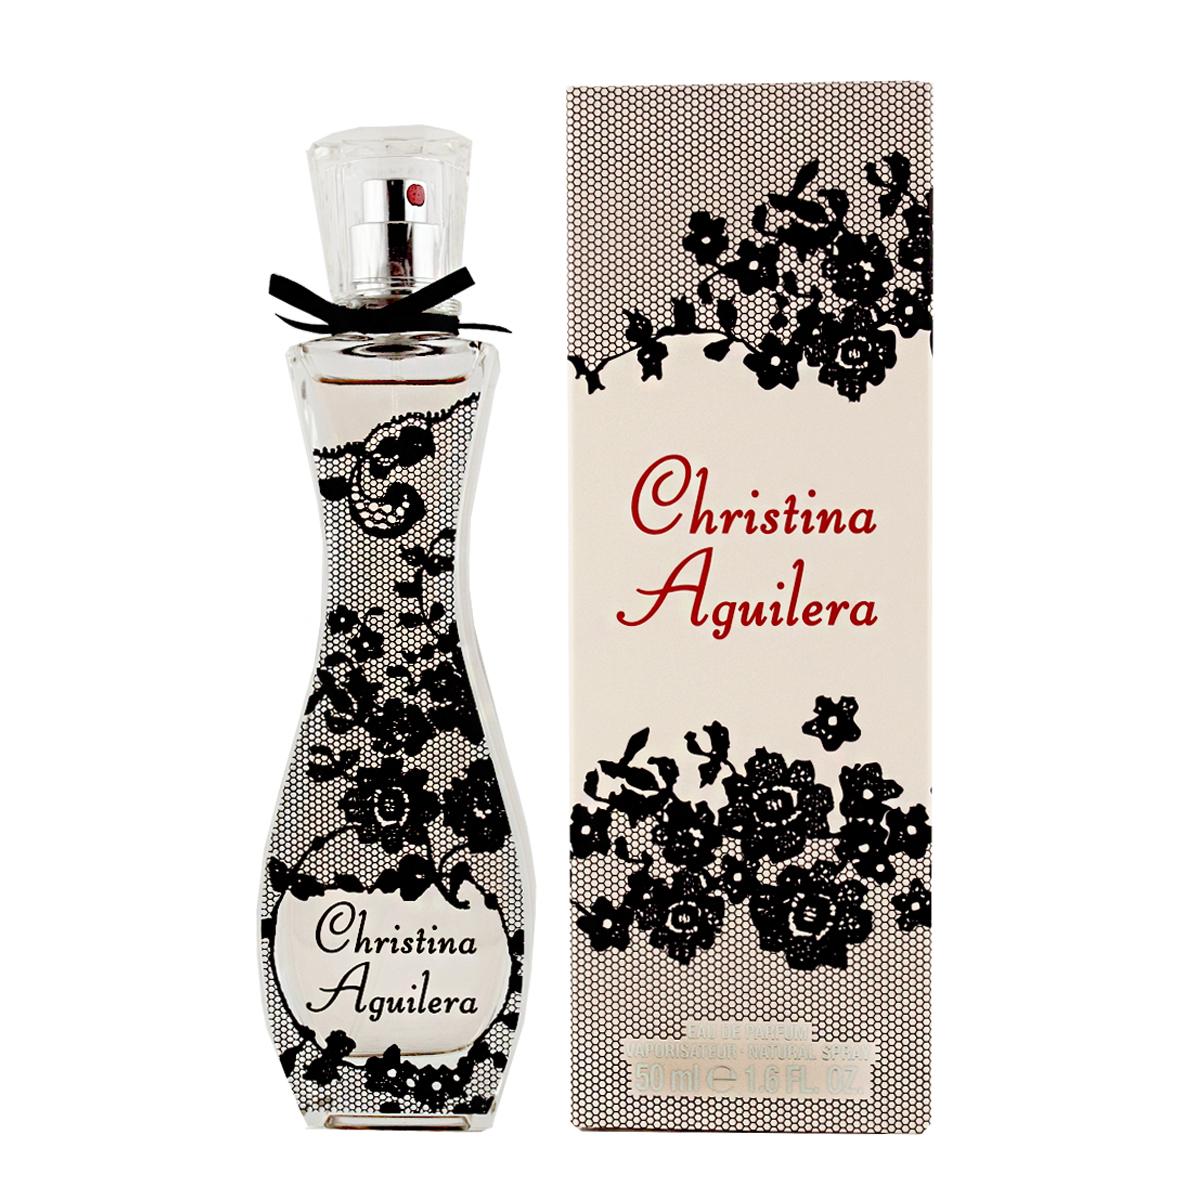 Christina Aguilera Christina Aguilera Eau De Parfum 50 ml (woman) 56939